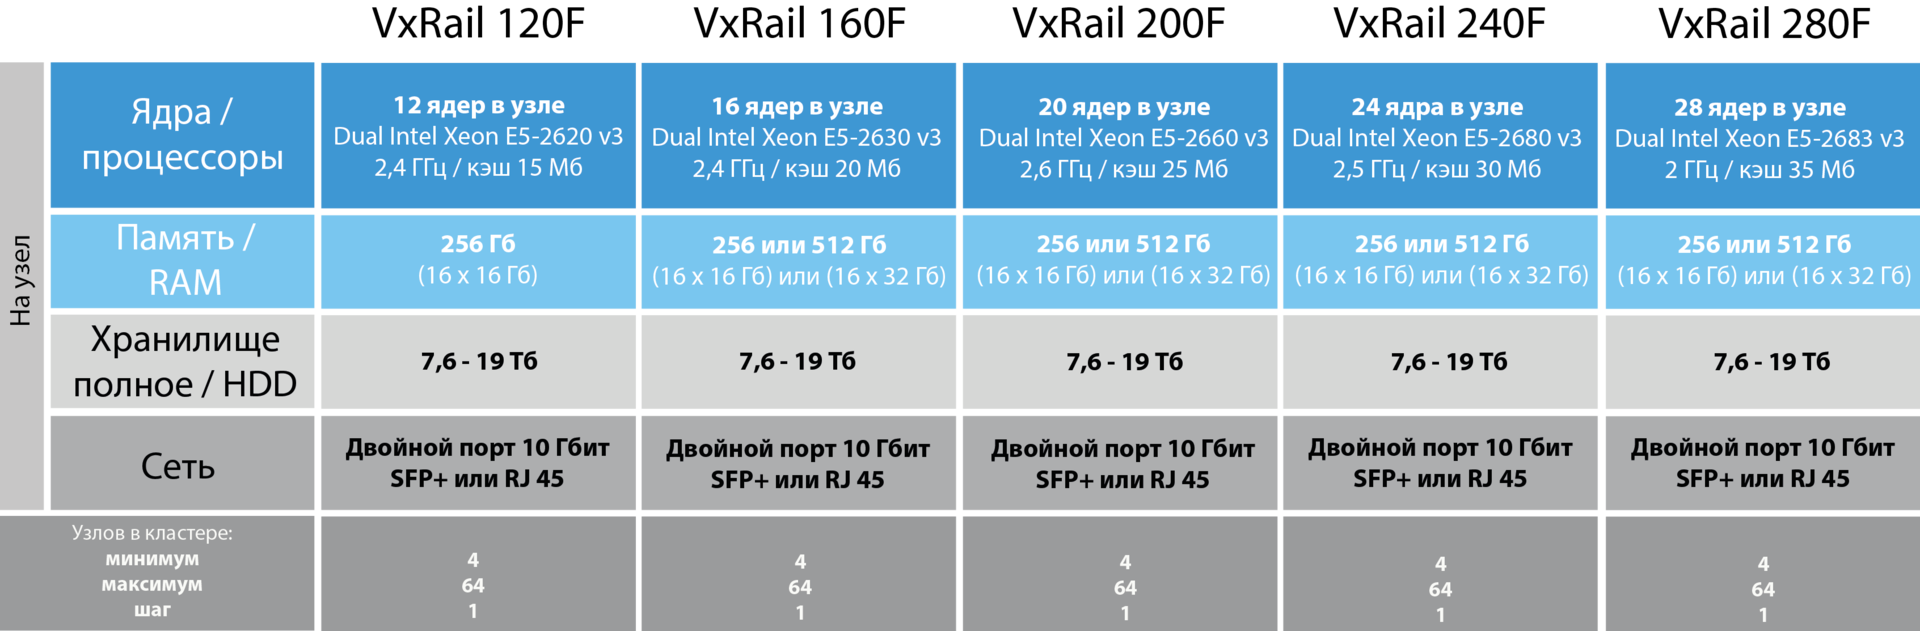 VxRail — гиперконвергентная СХД на все времена - 8